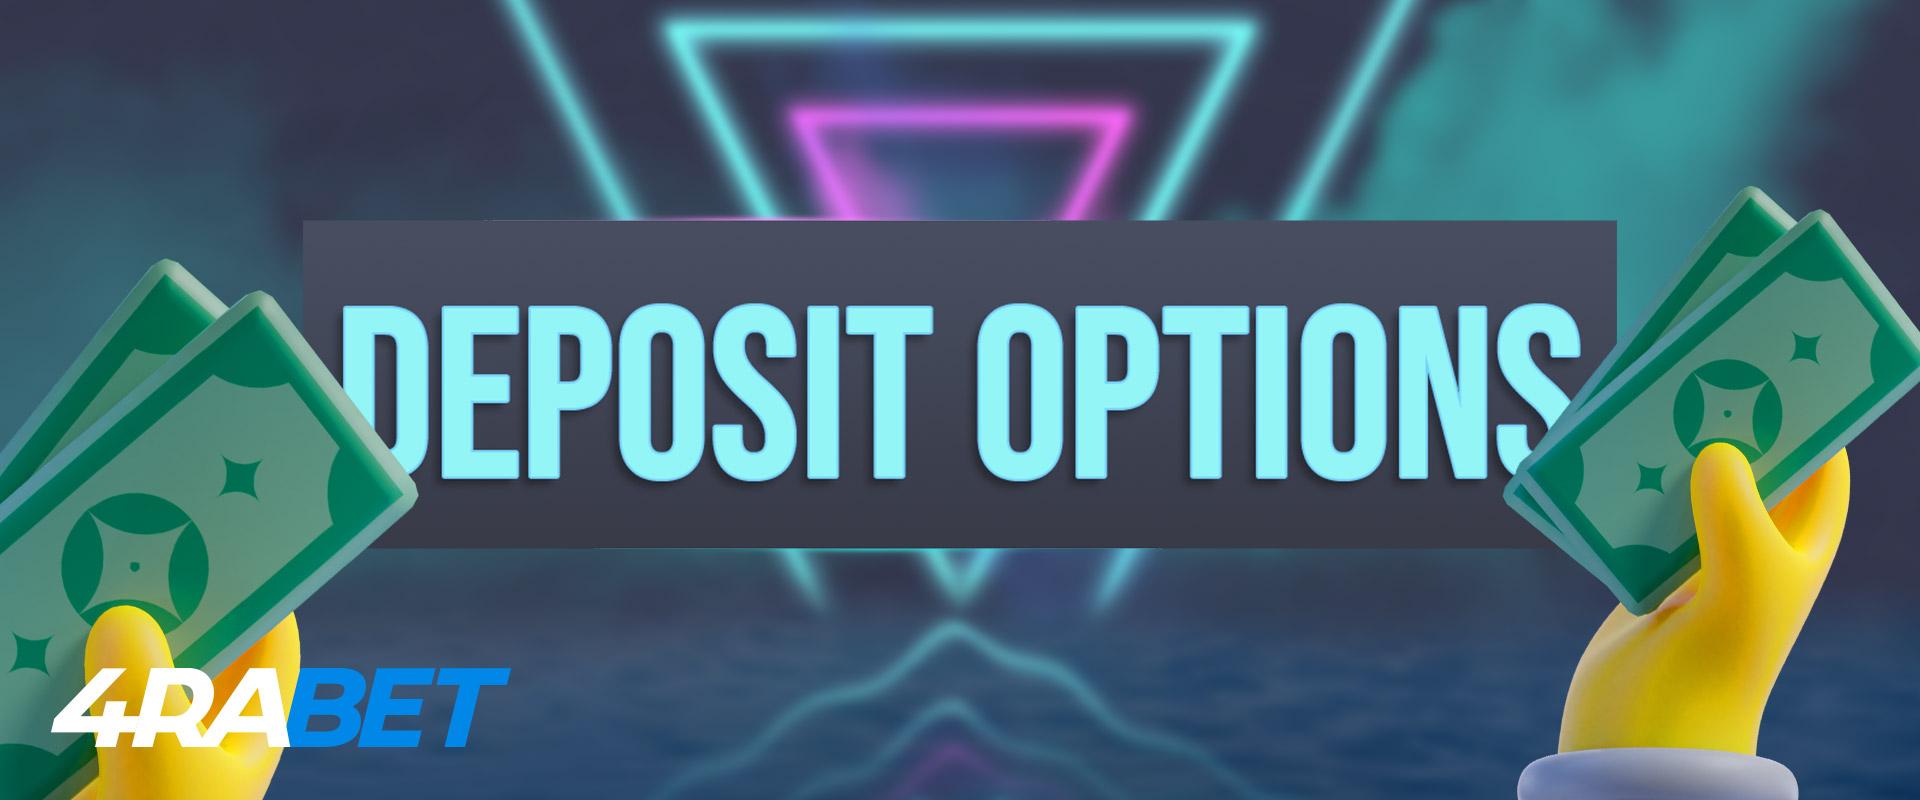 Deposit options on 4rabet.